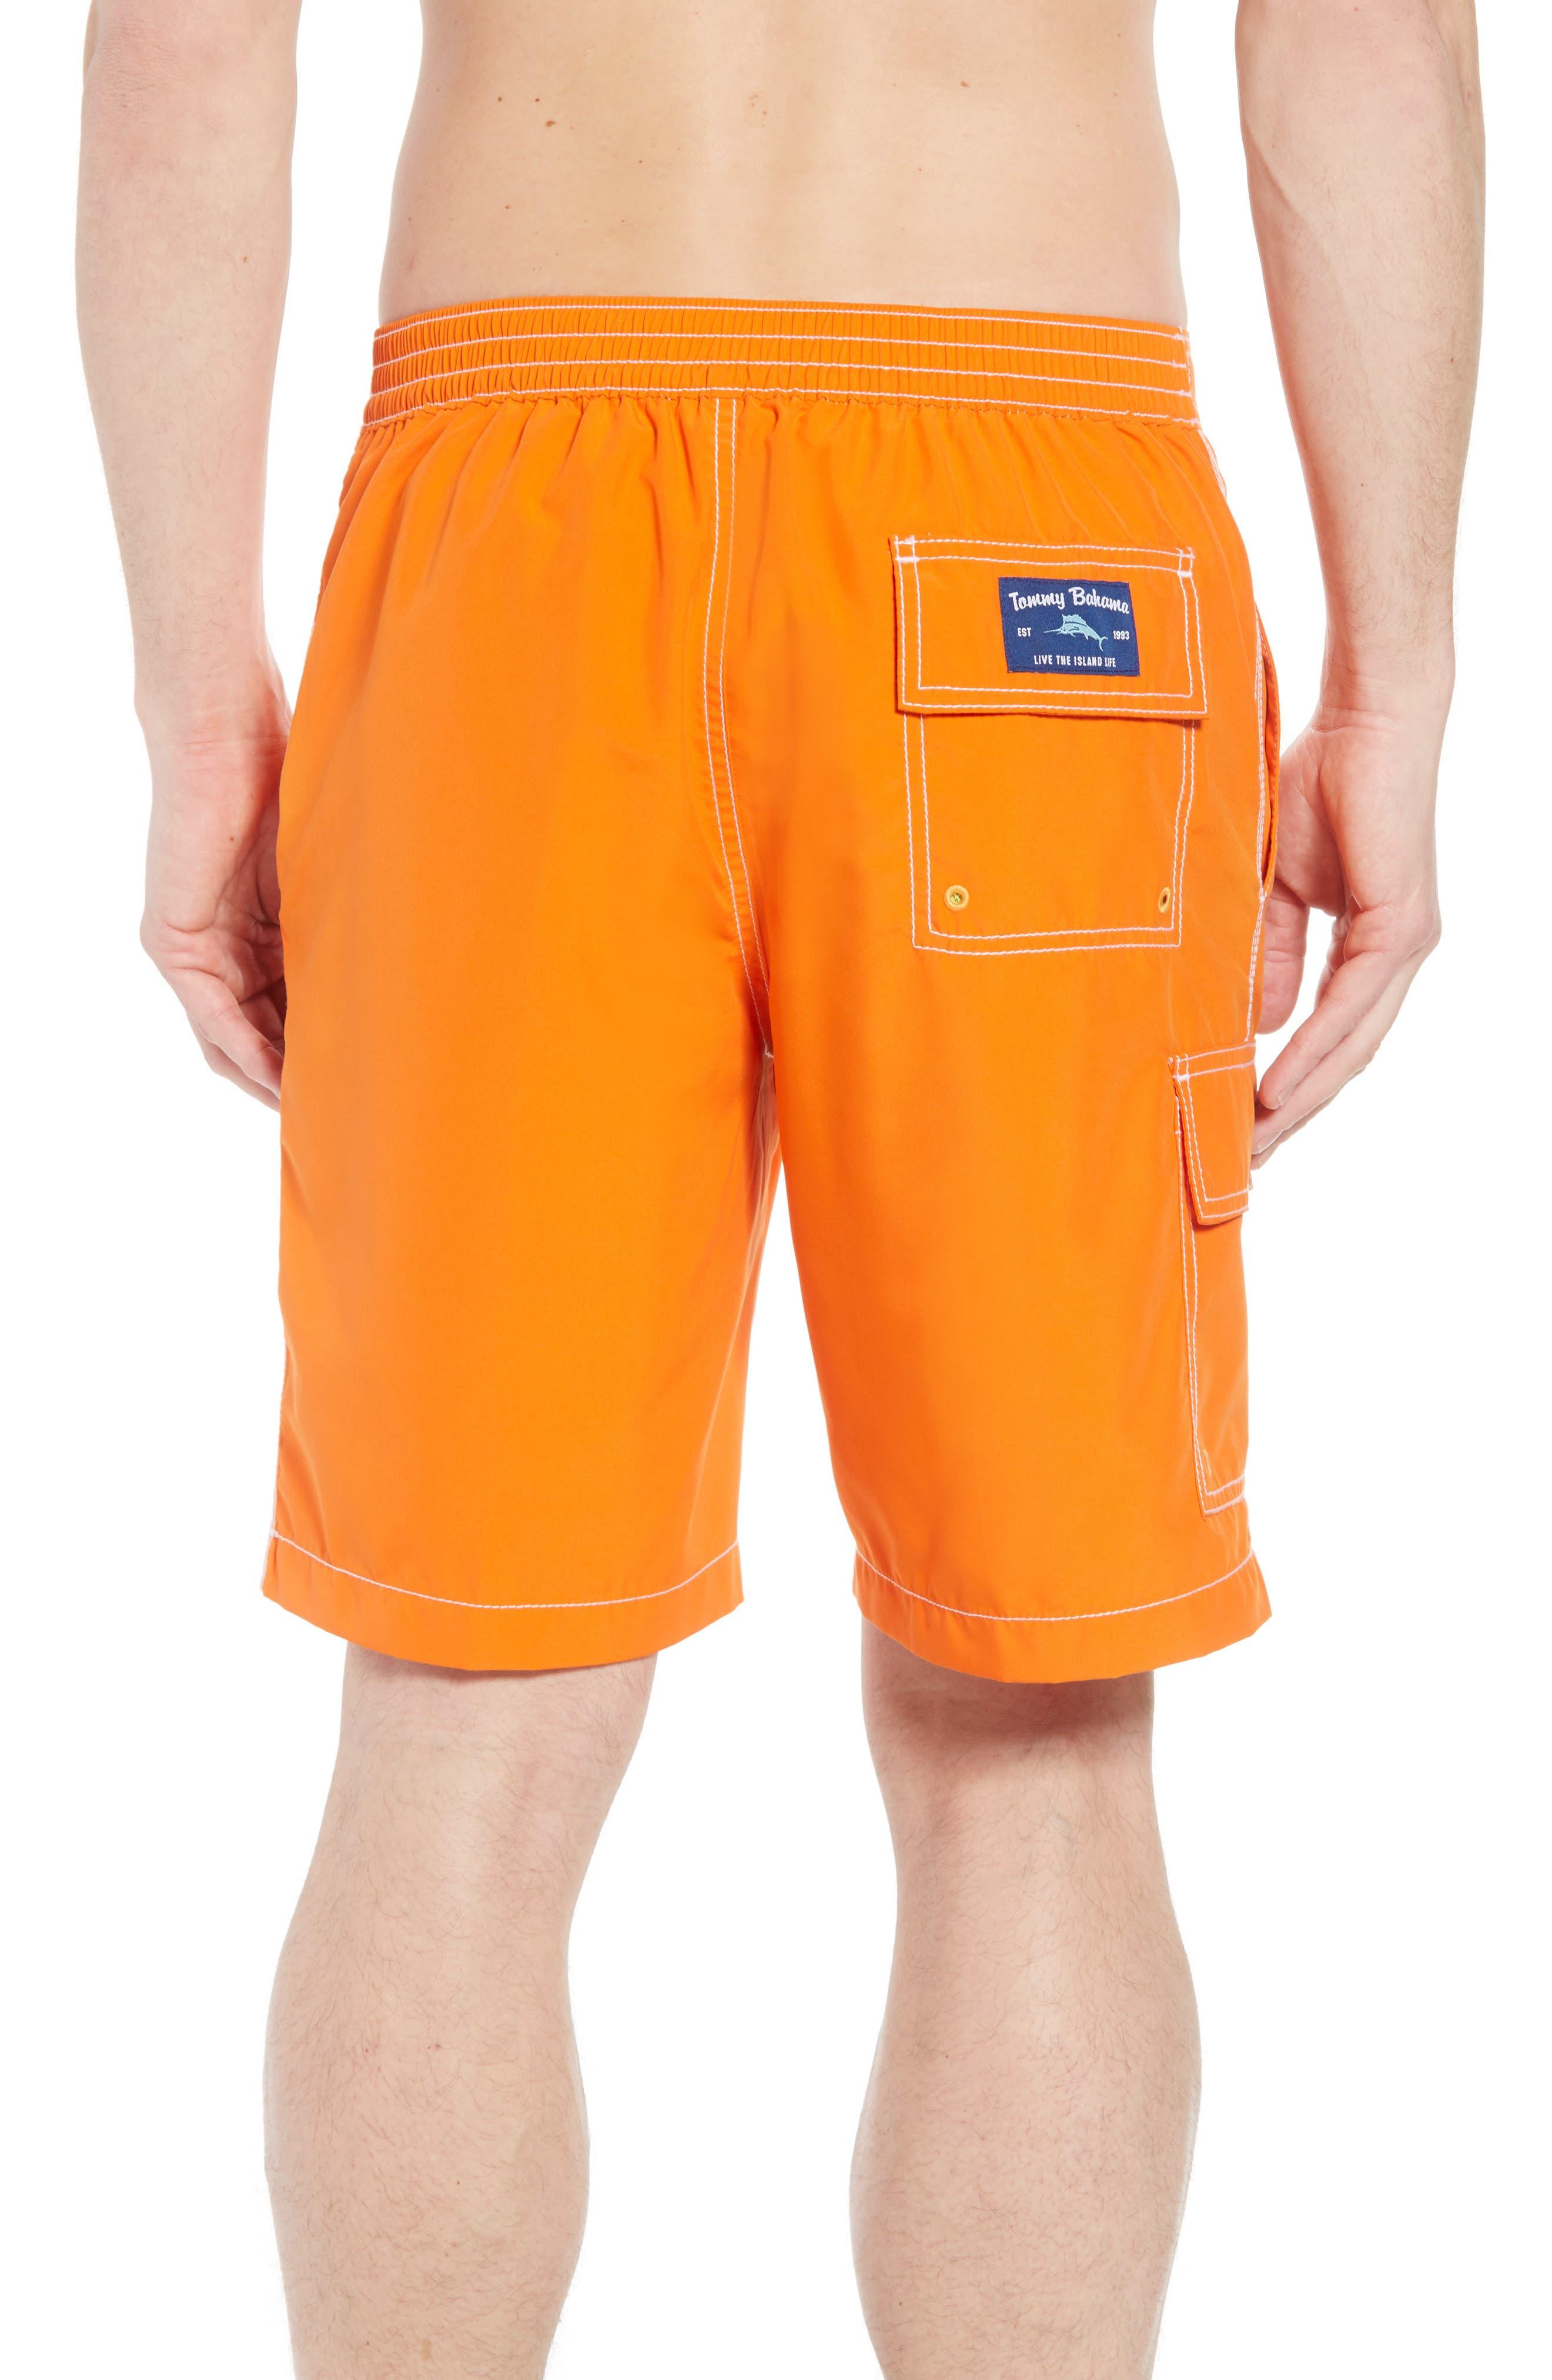 Baja Beach Board Shorts,                             Alternate thumbnail 2, color,                             Curuba